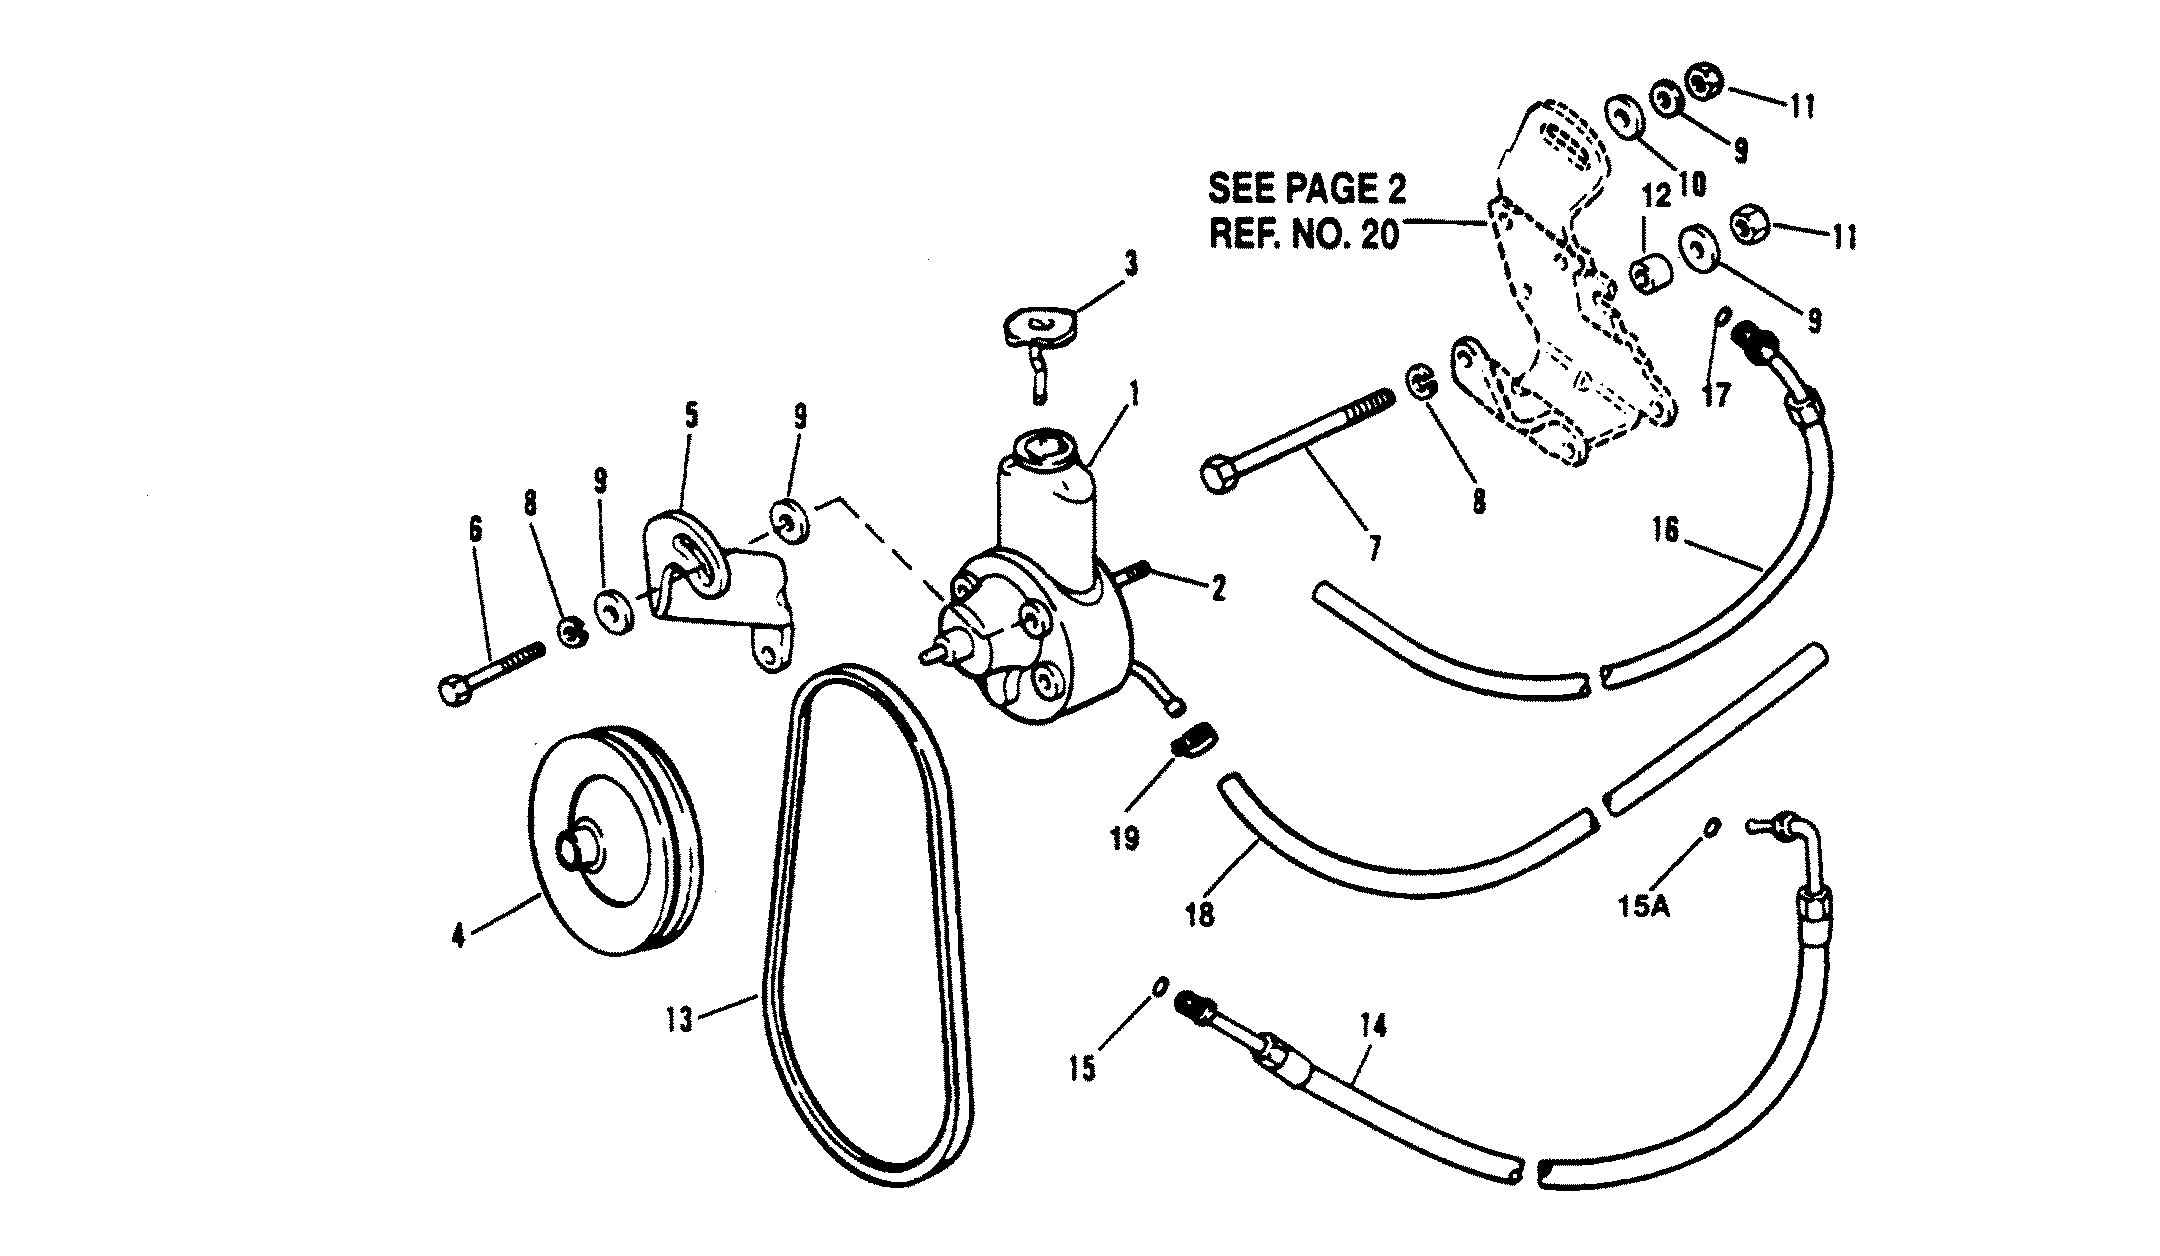 Power Steering Components For Mercruiser 5 7l Alpha Efi Tbi 5 7l Bravo Efi Tbi Engine